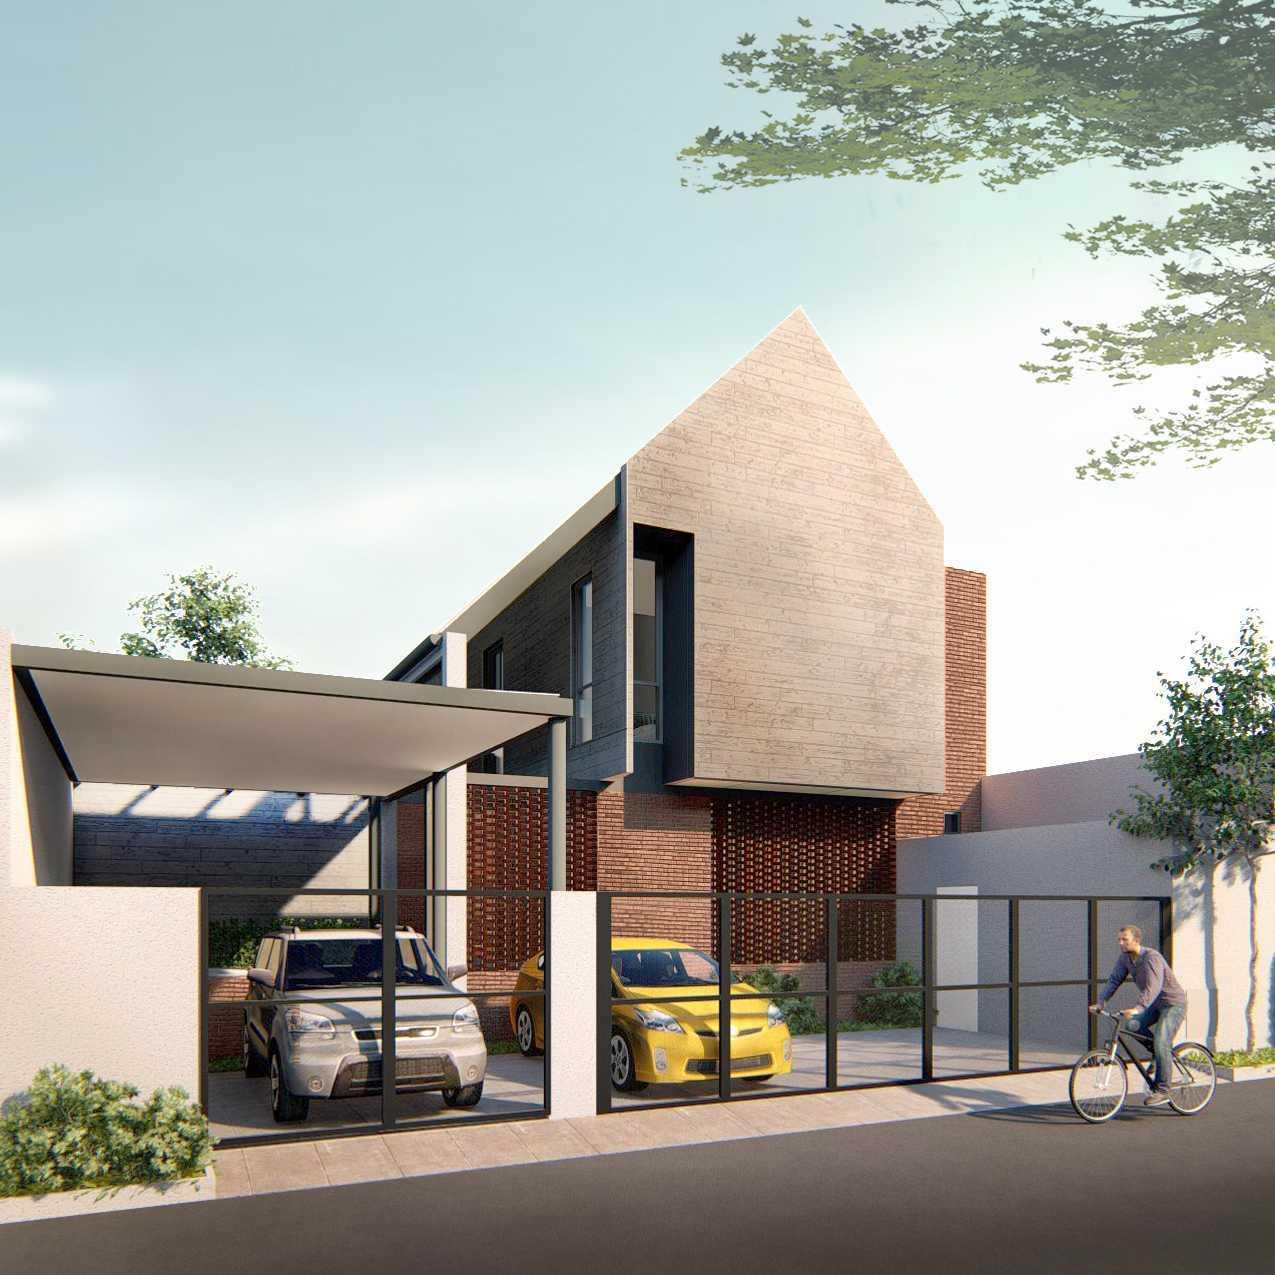 Labworks Architect Tf House Jakarta, Daerah Khusus Ibukota Jakarta, Indonesia Jakarta, Daerah Khusus Ibukota Jakarta, Indonesia Labworks-Architect-Tf-House  52093